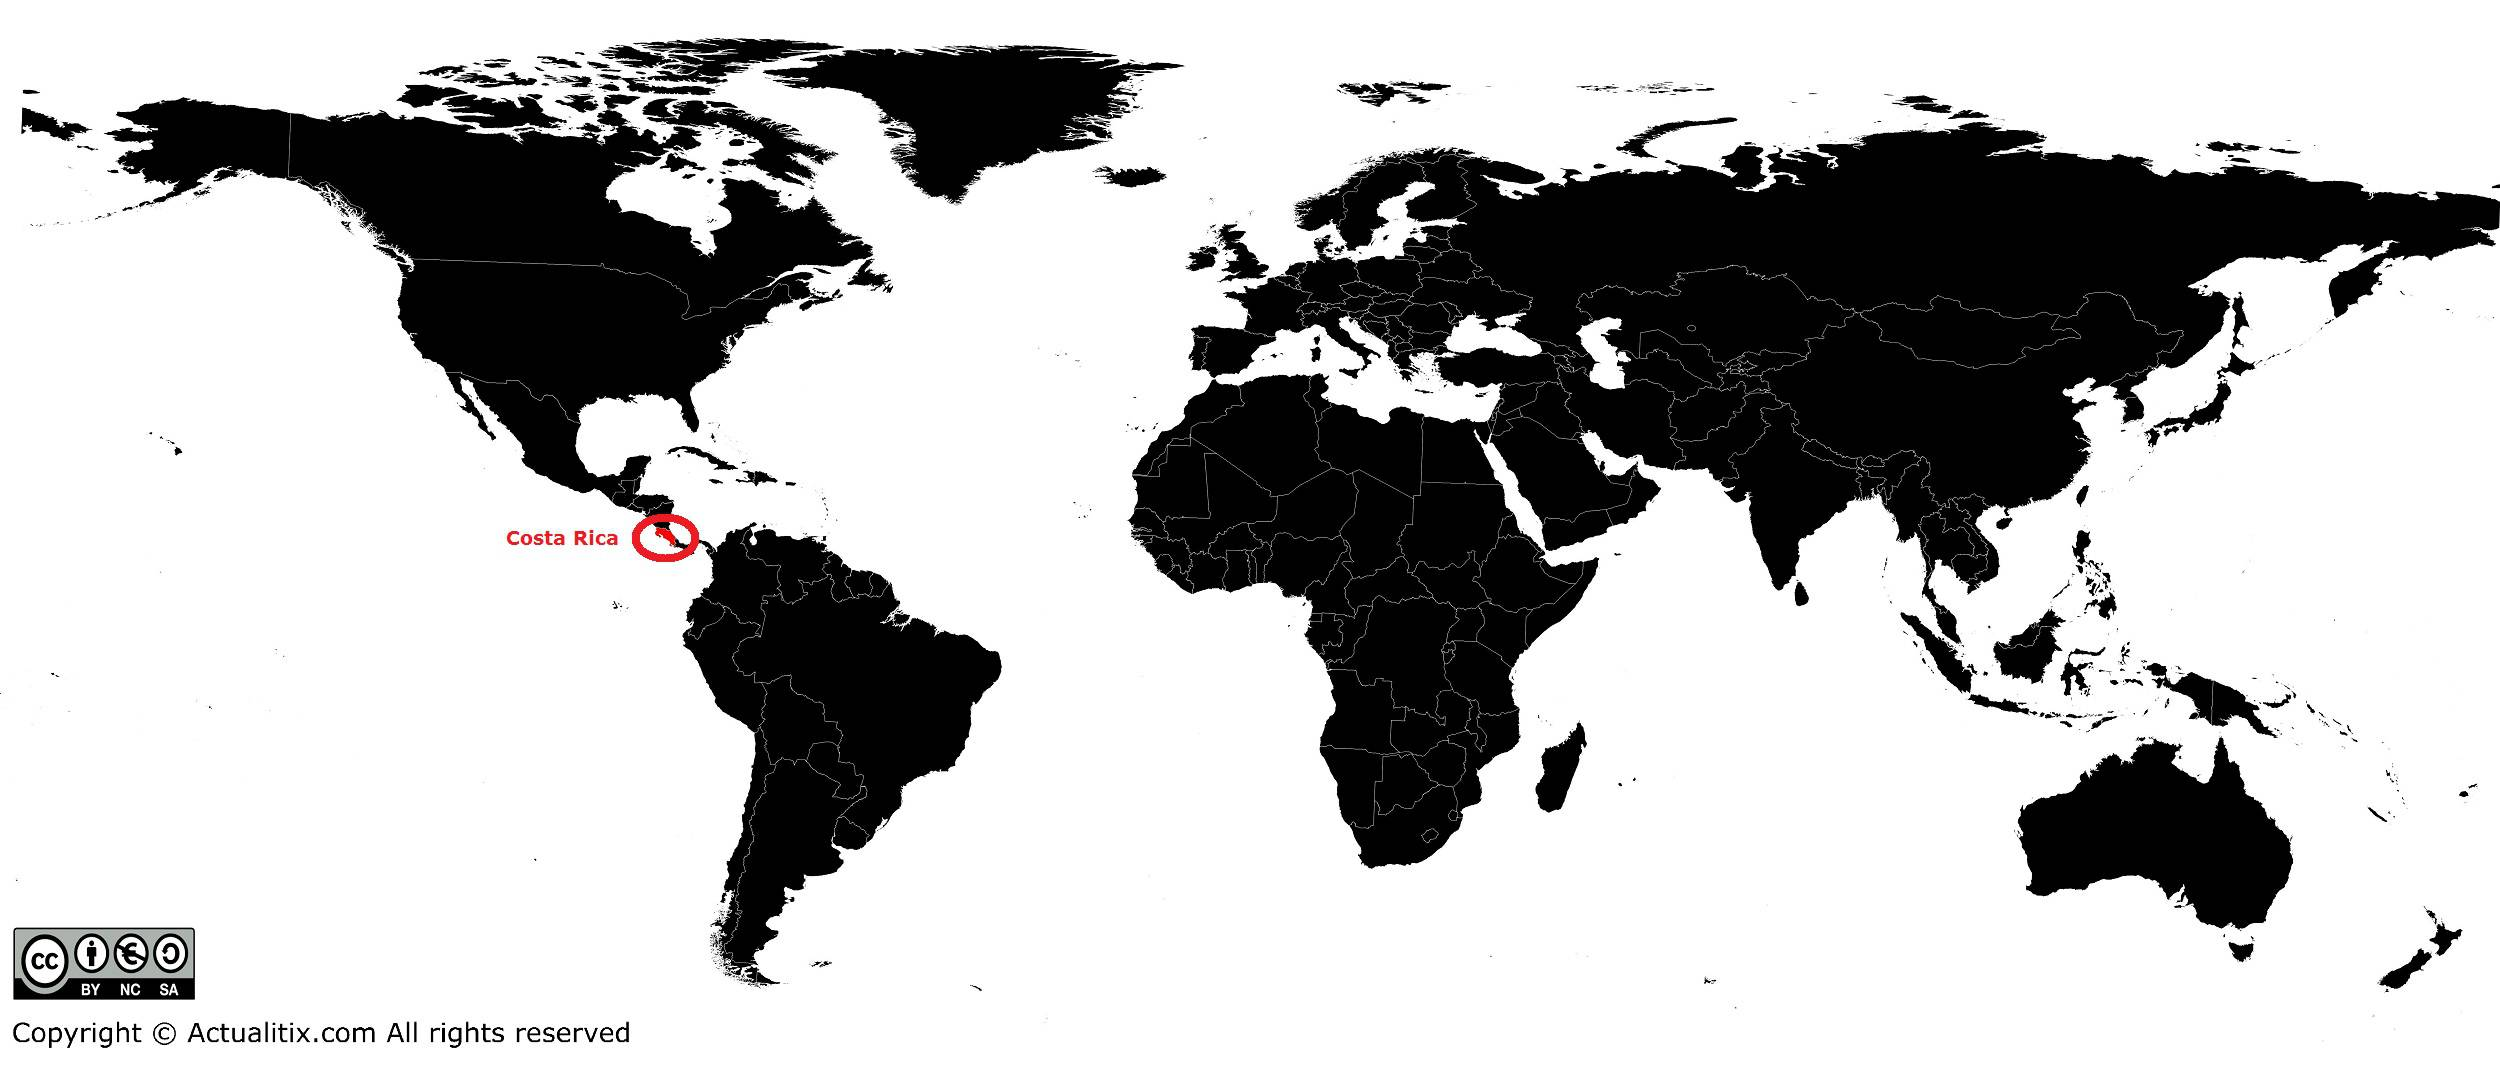 Costa Rica sur une carte du monde